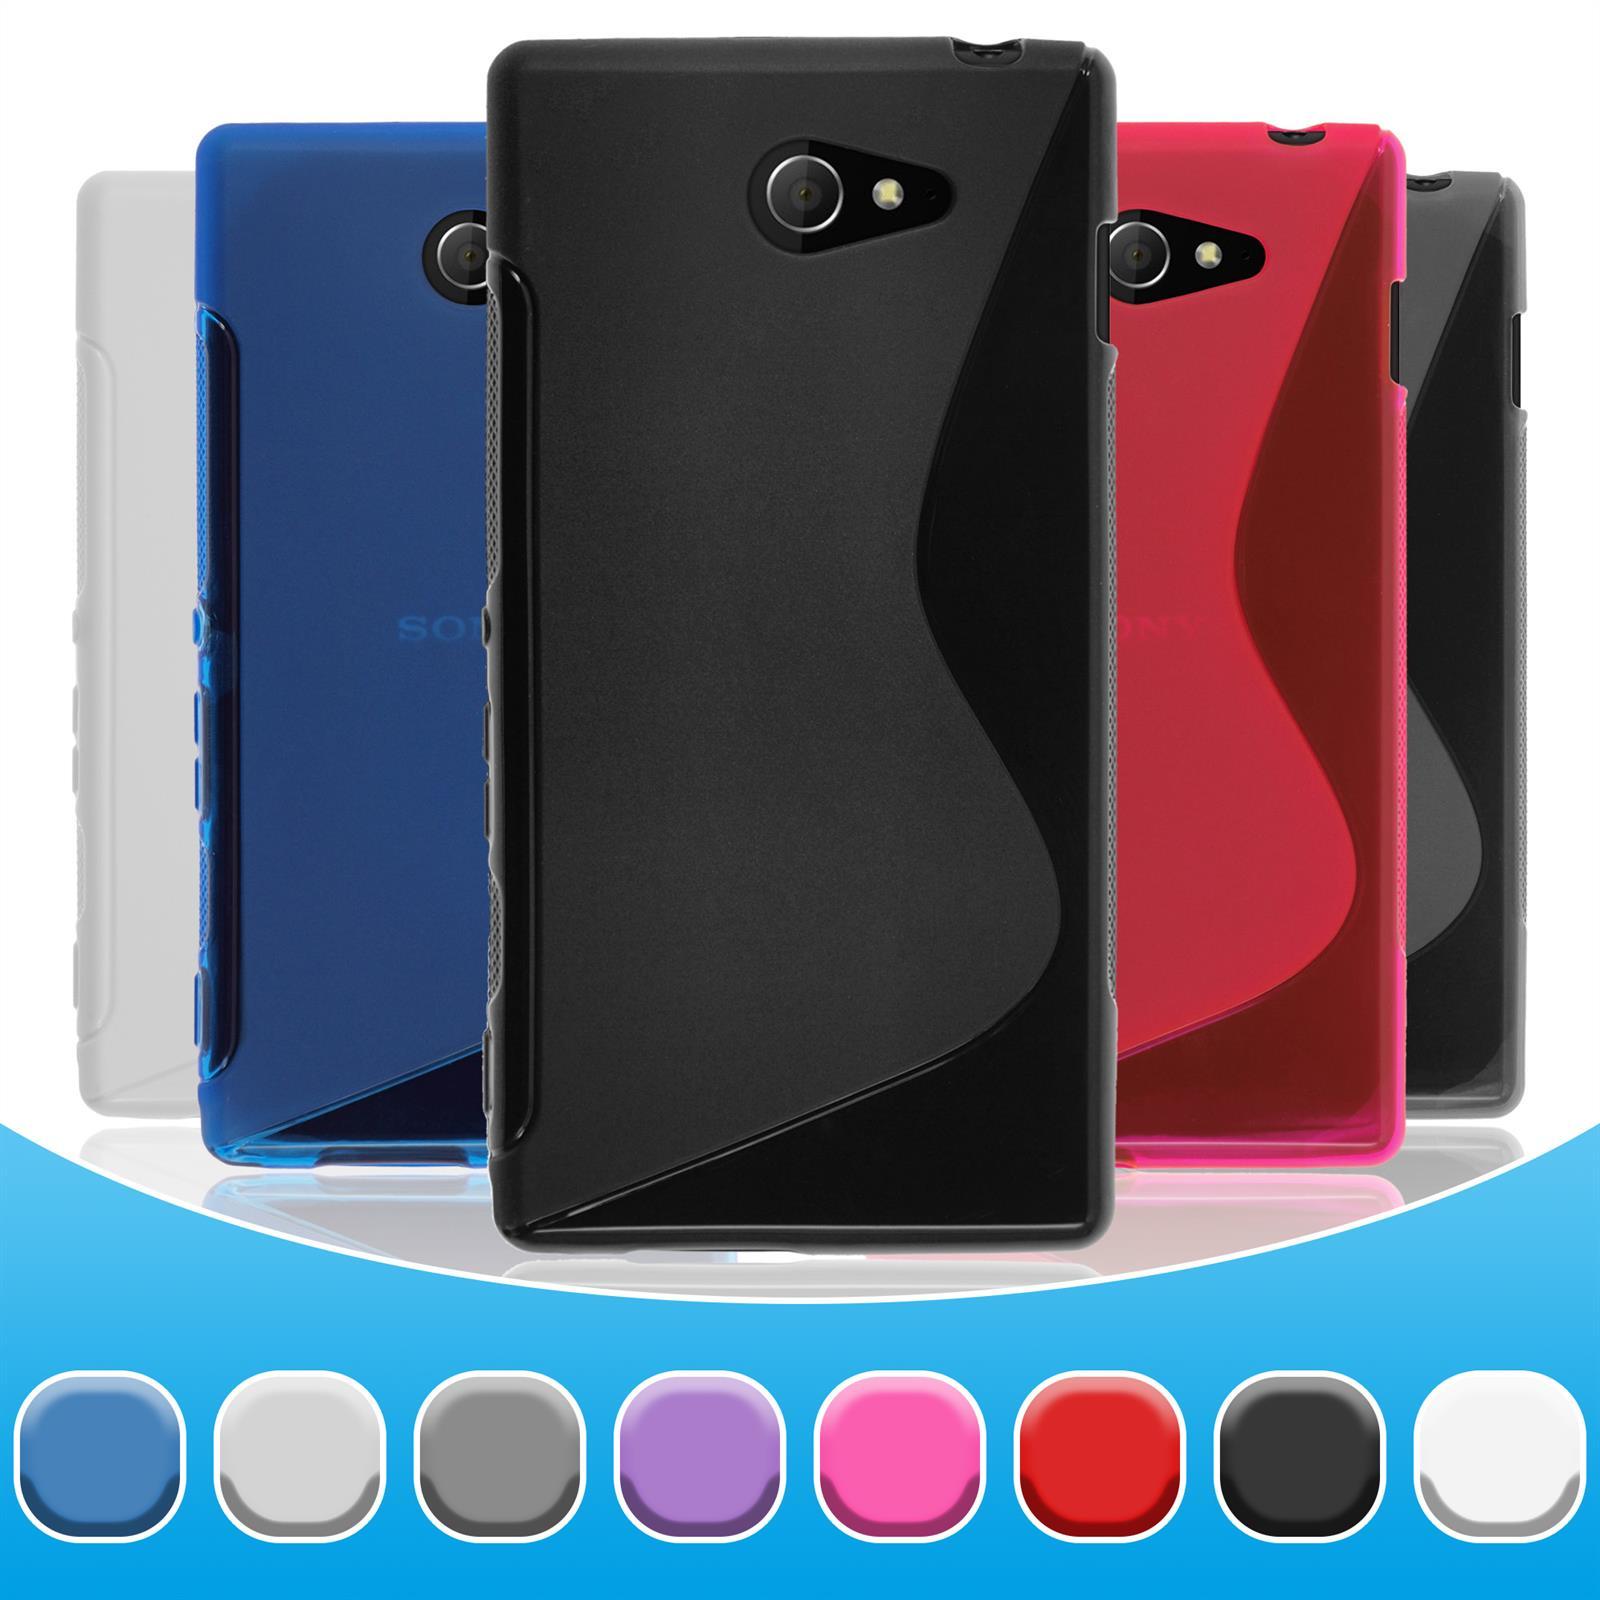 Sony Xperia sony xperia miro phone case : Schutzhulle-fur-Sony-Xperia-S-Style-Hullen-Cover-Case-Schutzfolien